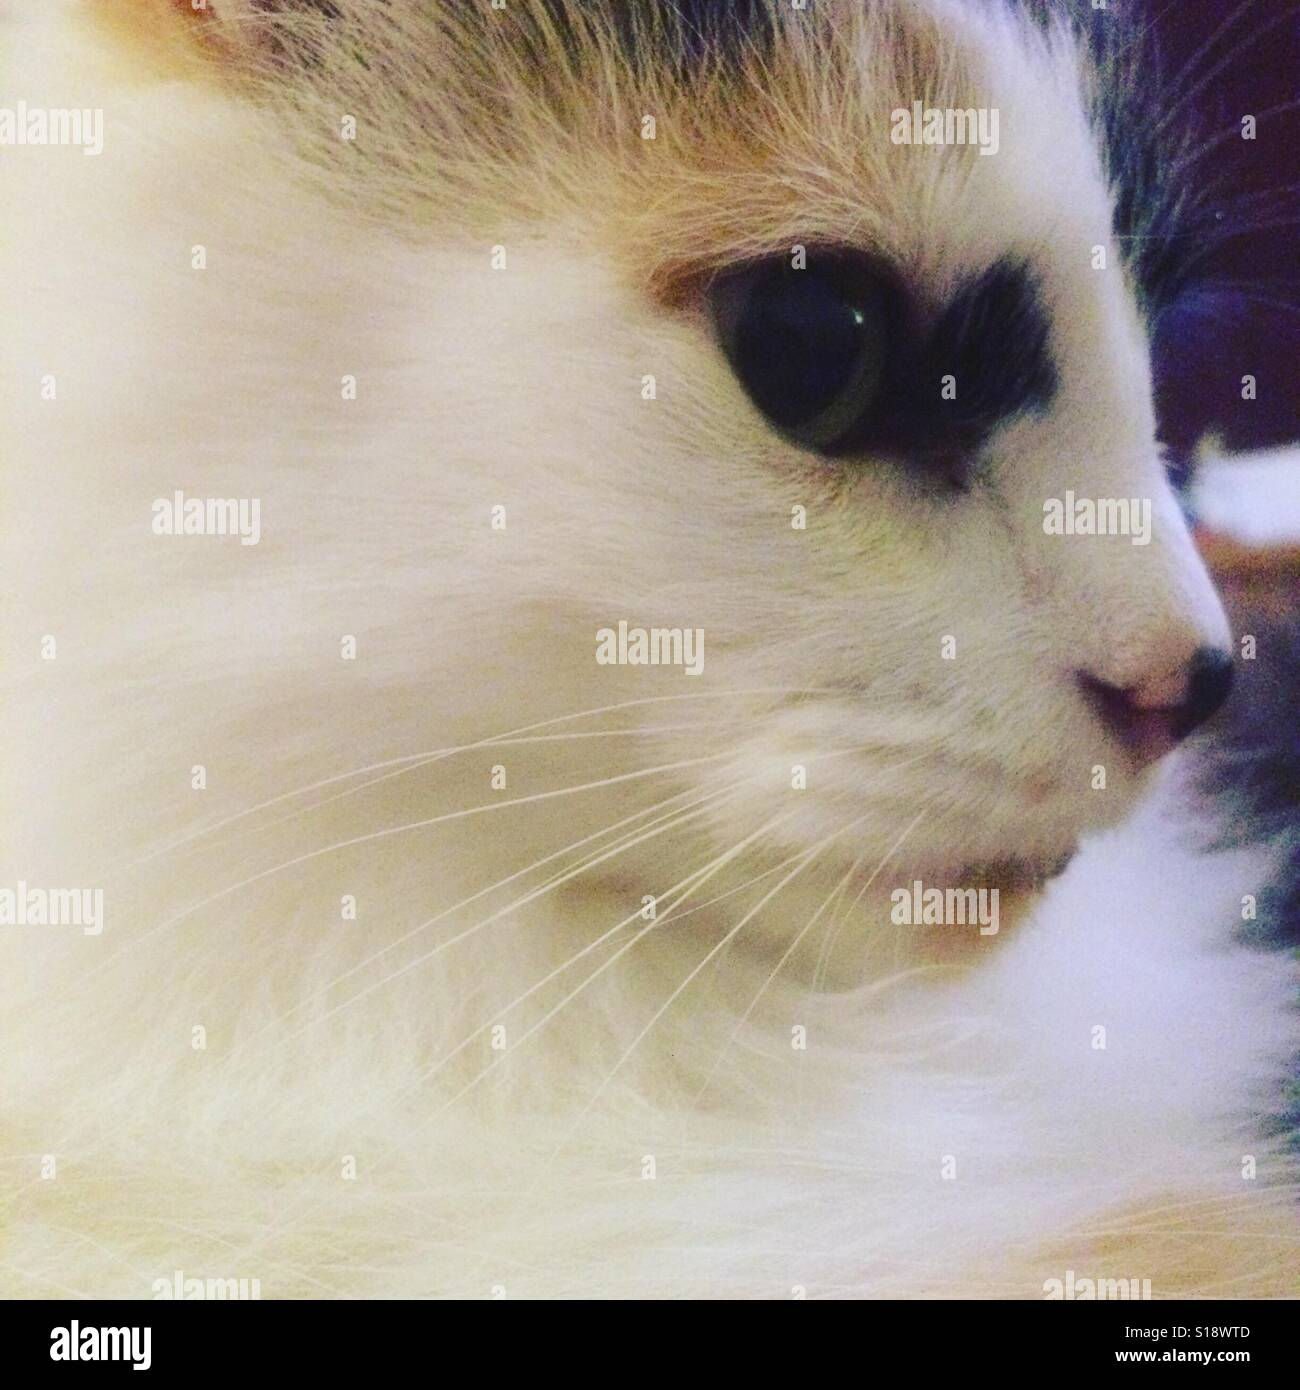 Cats eye! - Stock Image